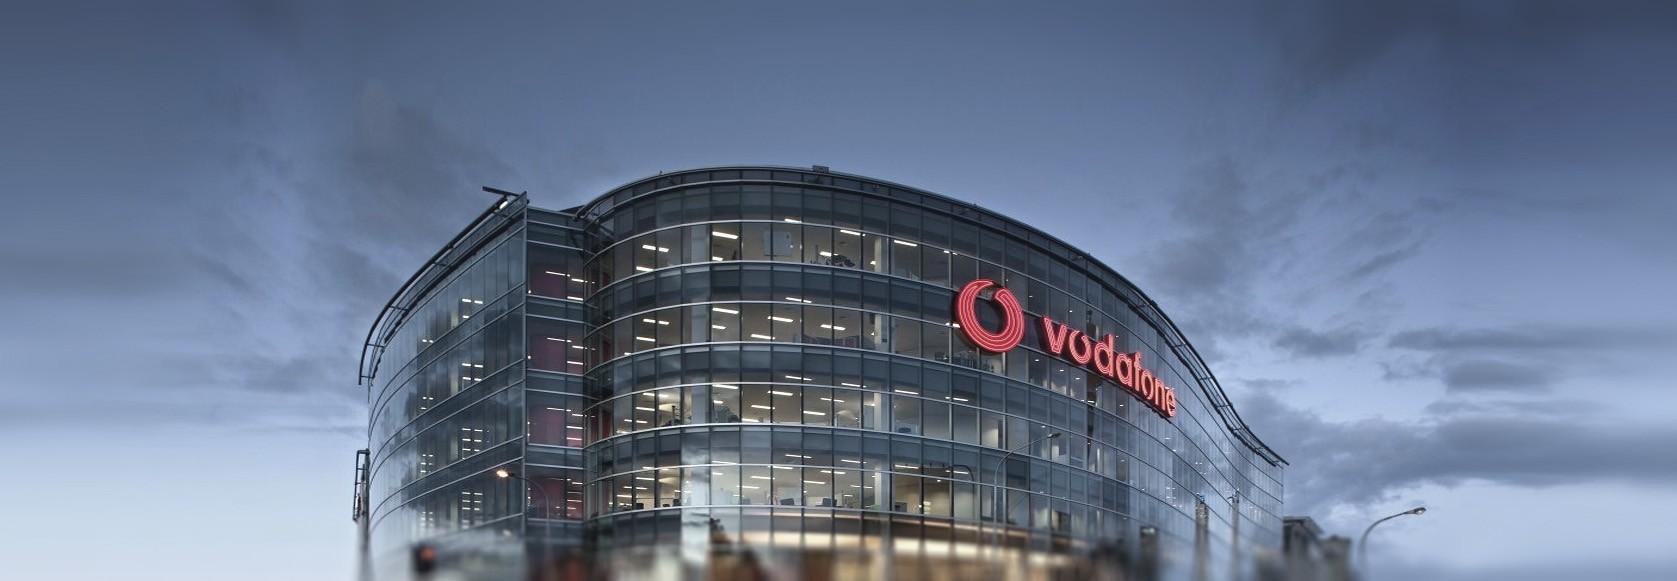 Vodafone New Zealand - Halberd Bastion